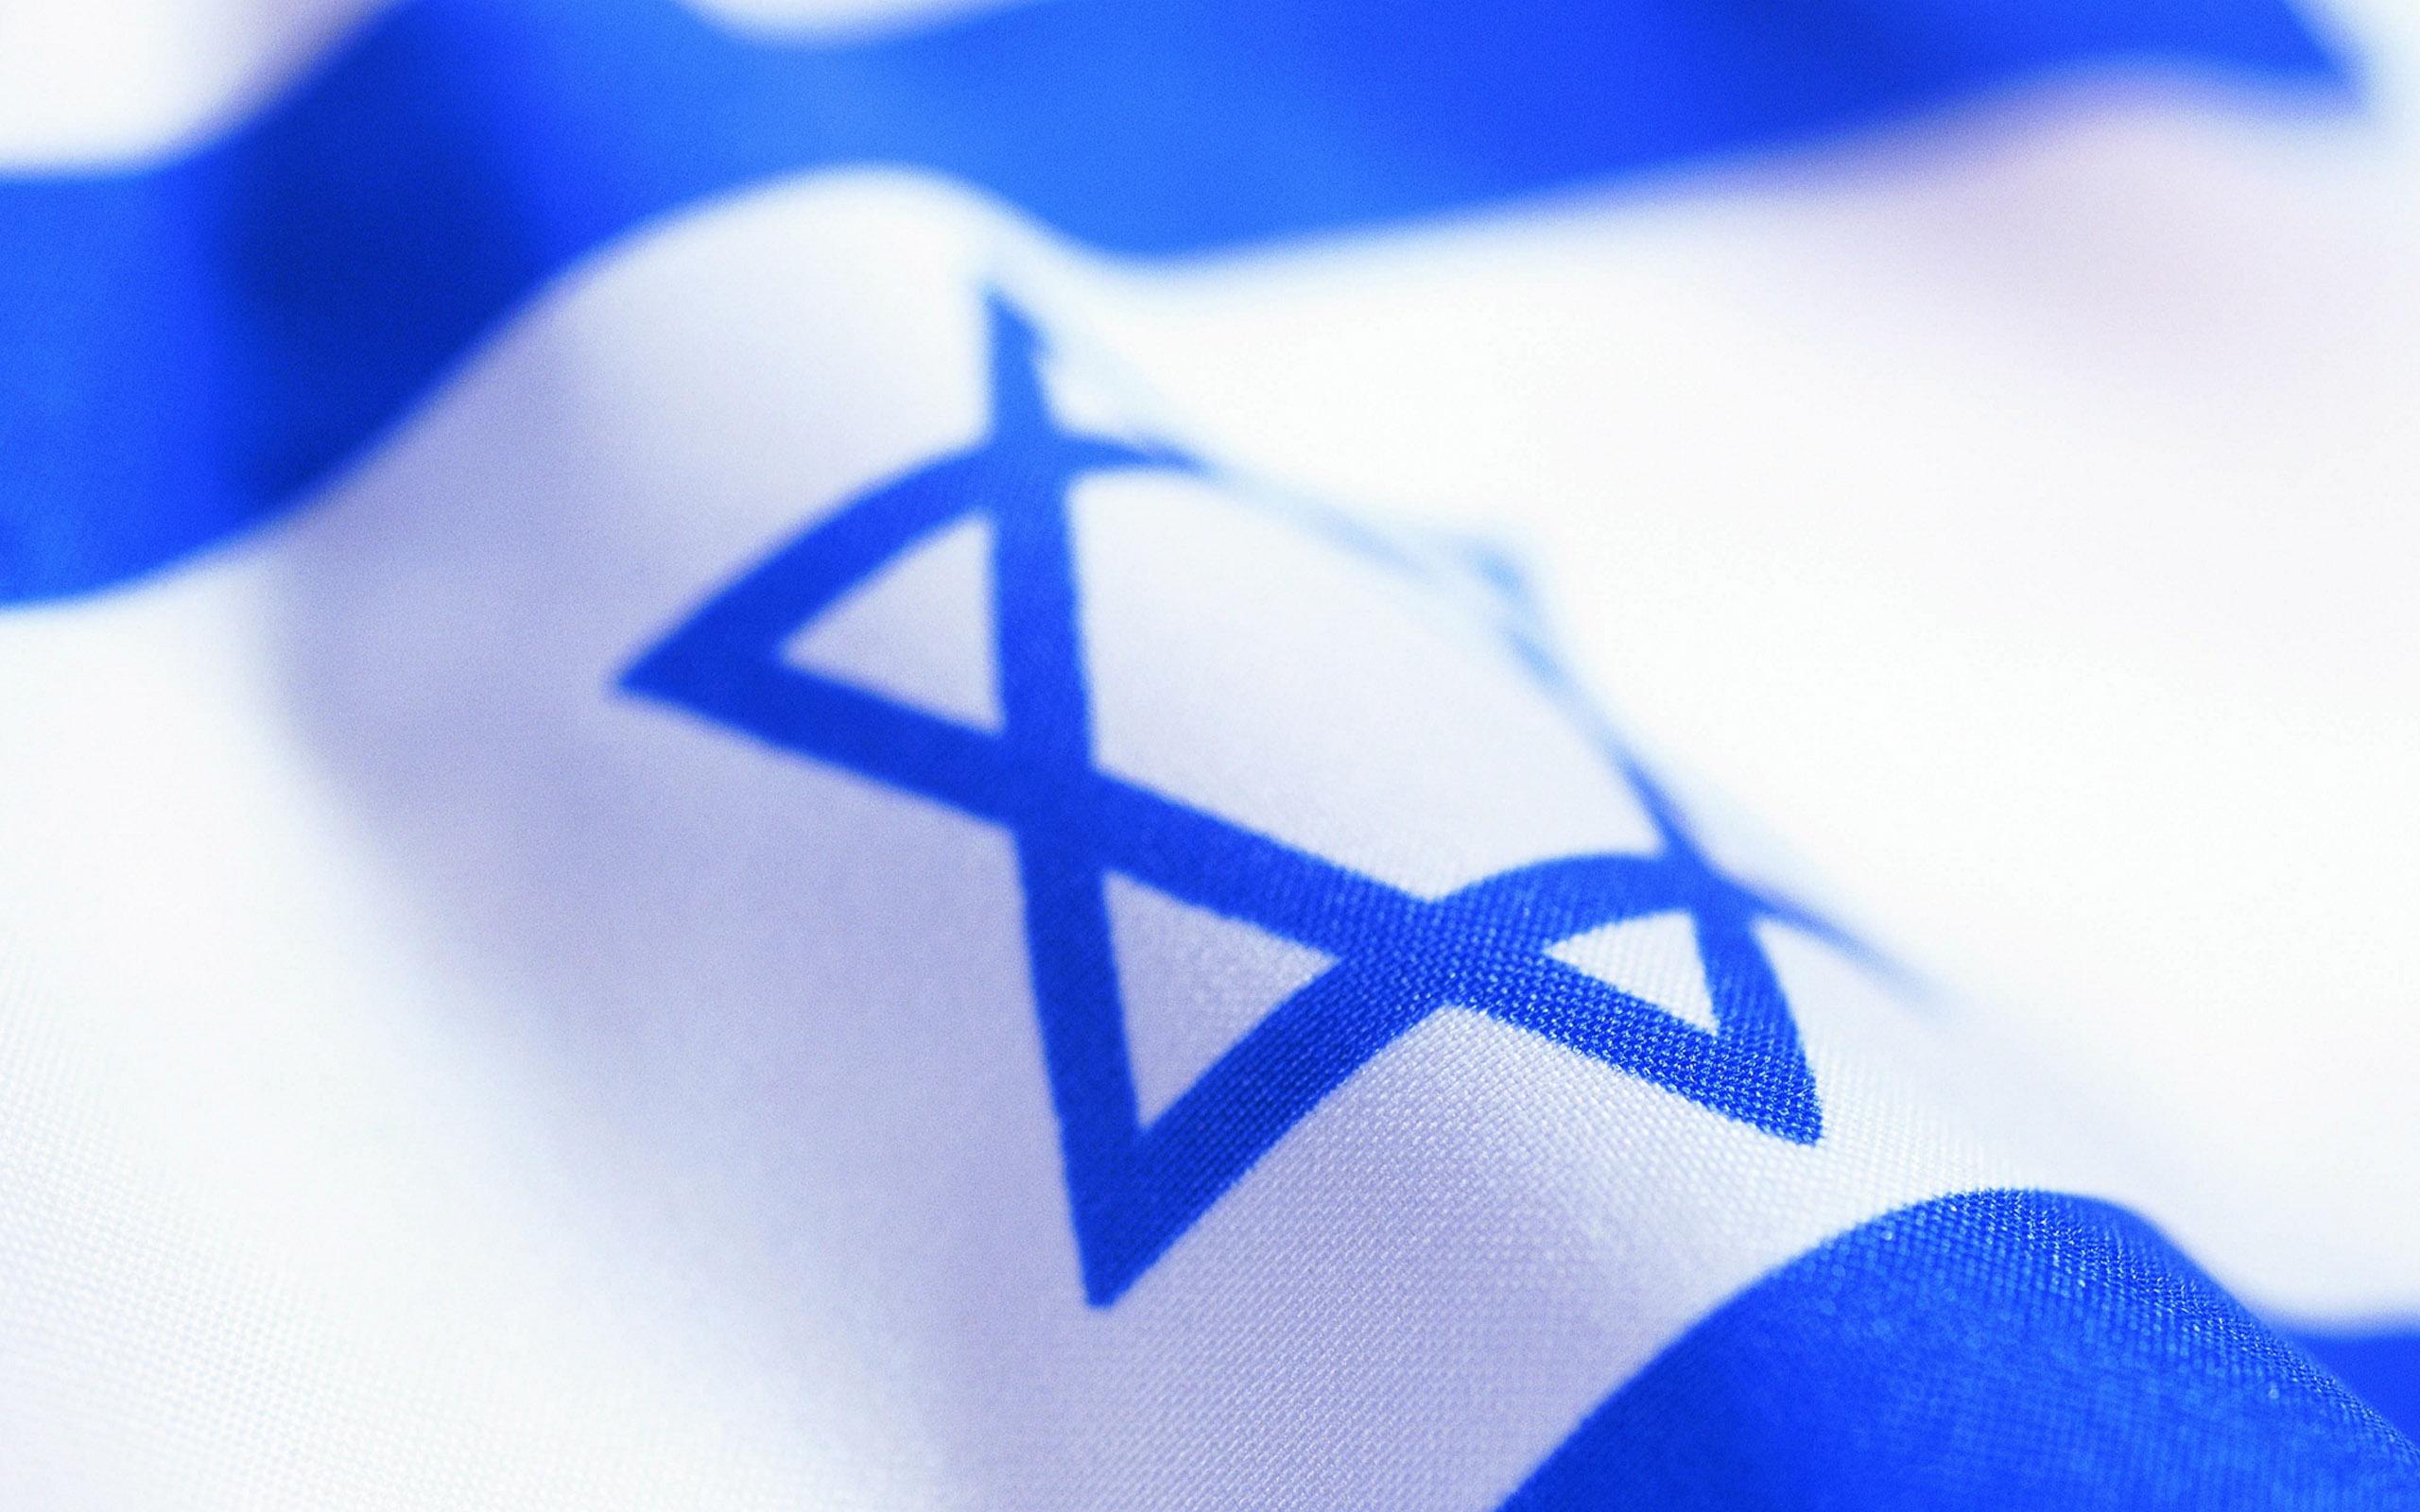 jewish flag wallpaper of - photo #9